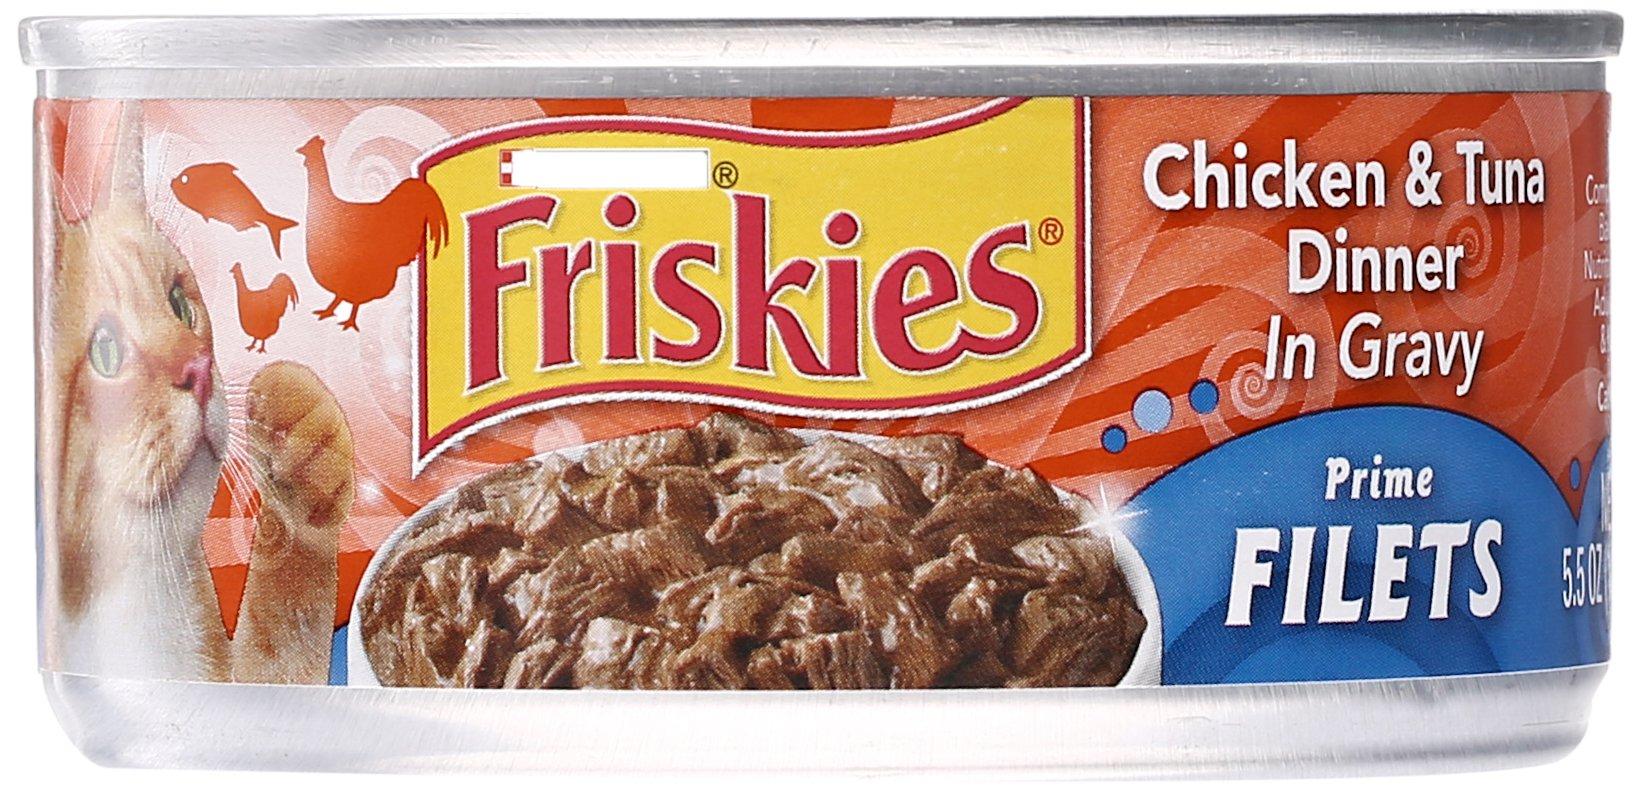 Friskies Prime Filets Chicken & Tuna Dinner in Gravy Cat Food, 1 ct